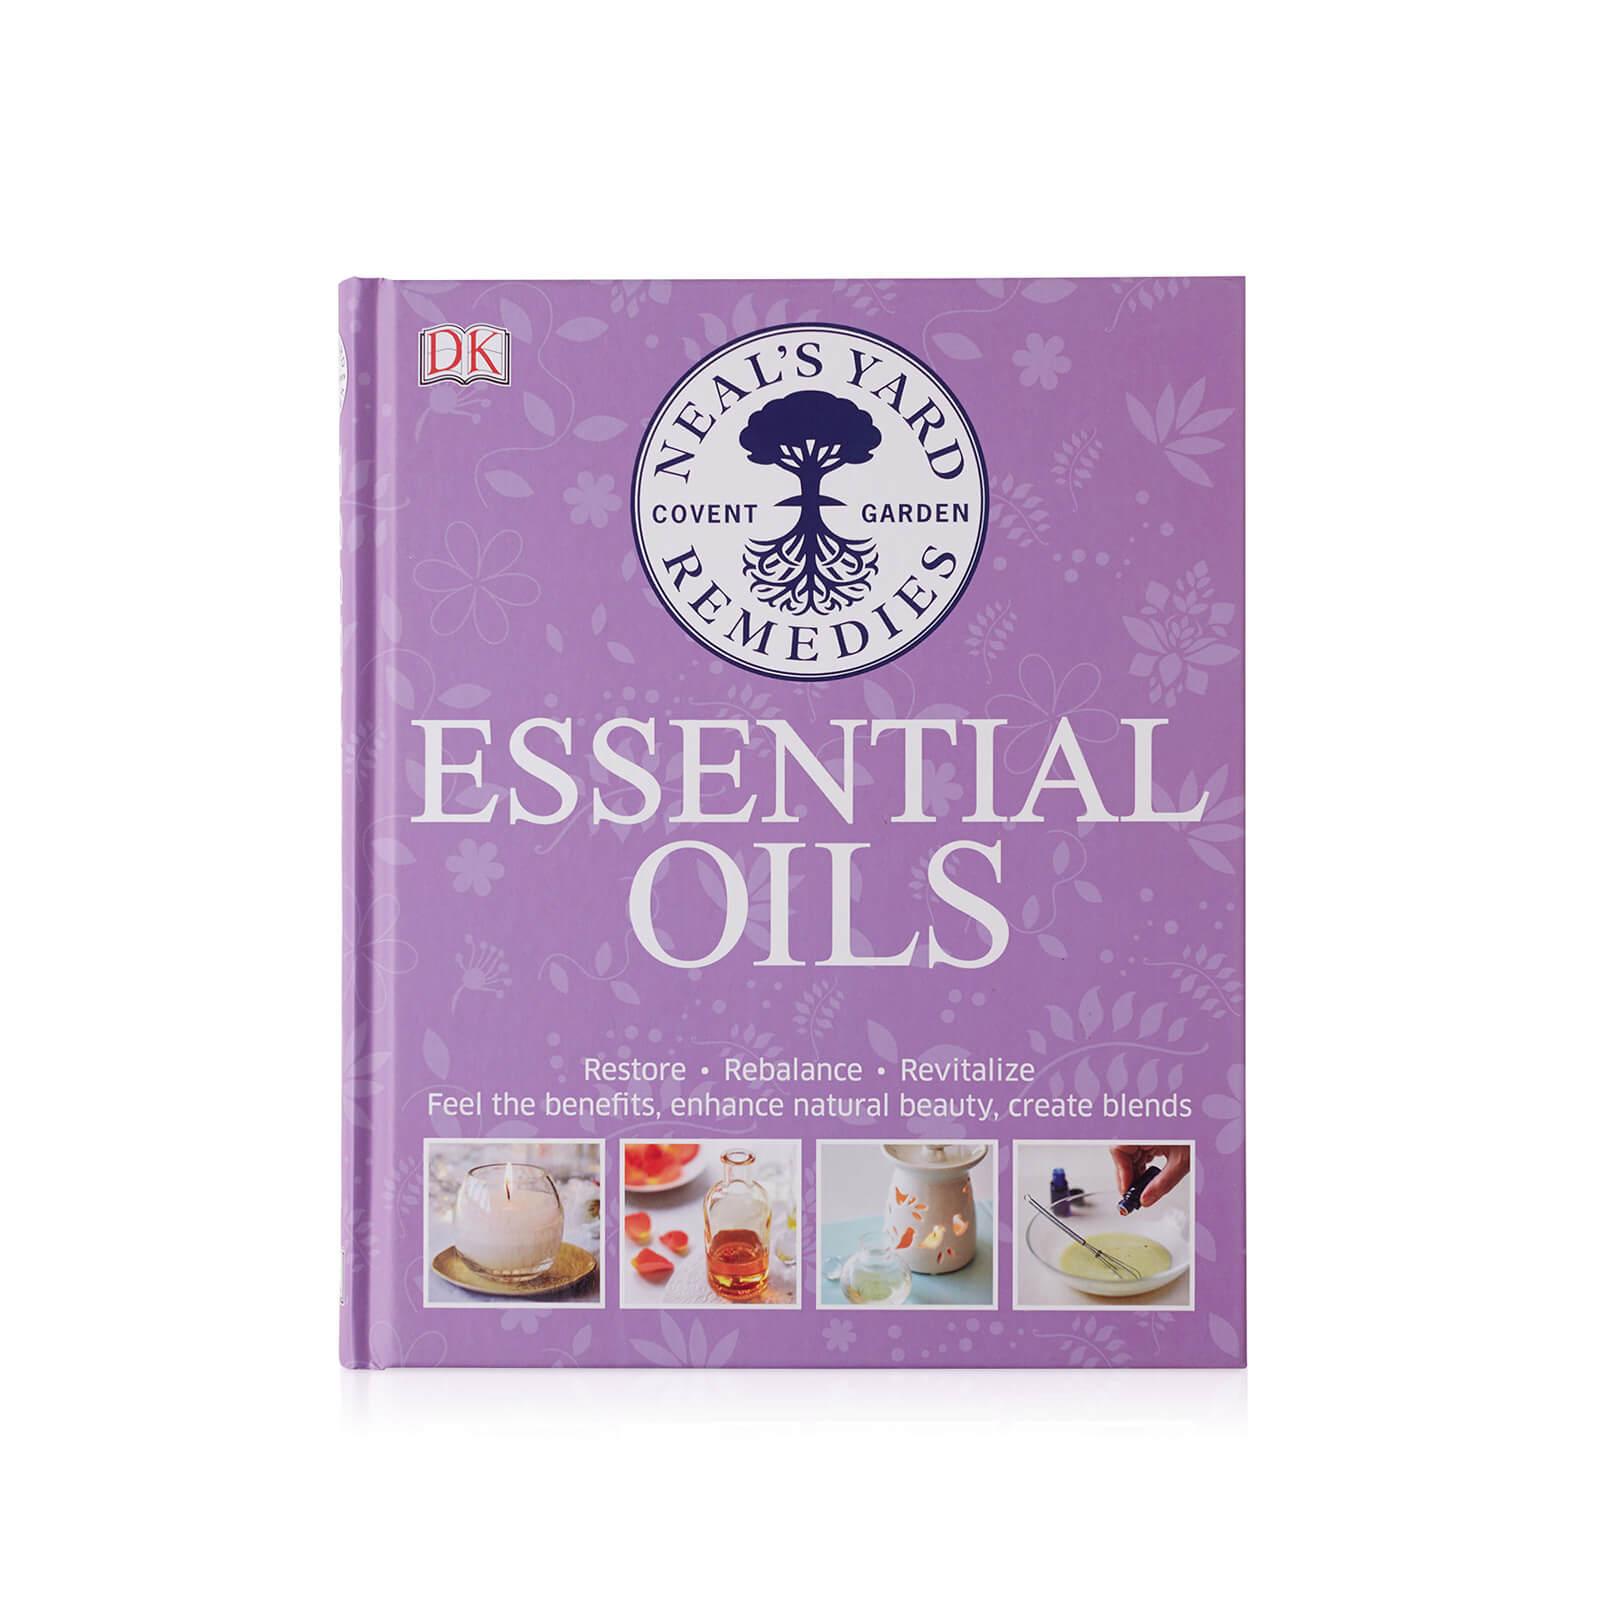 Neal's Yard Remedies Essential Oils Book